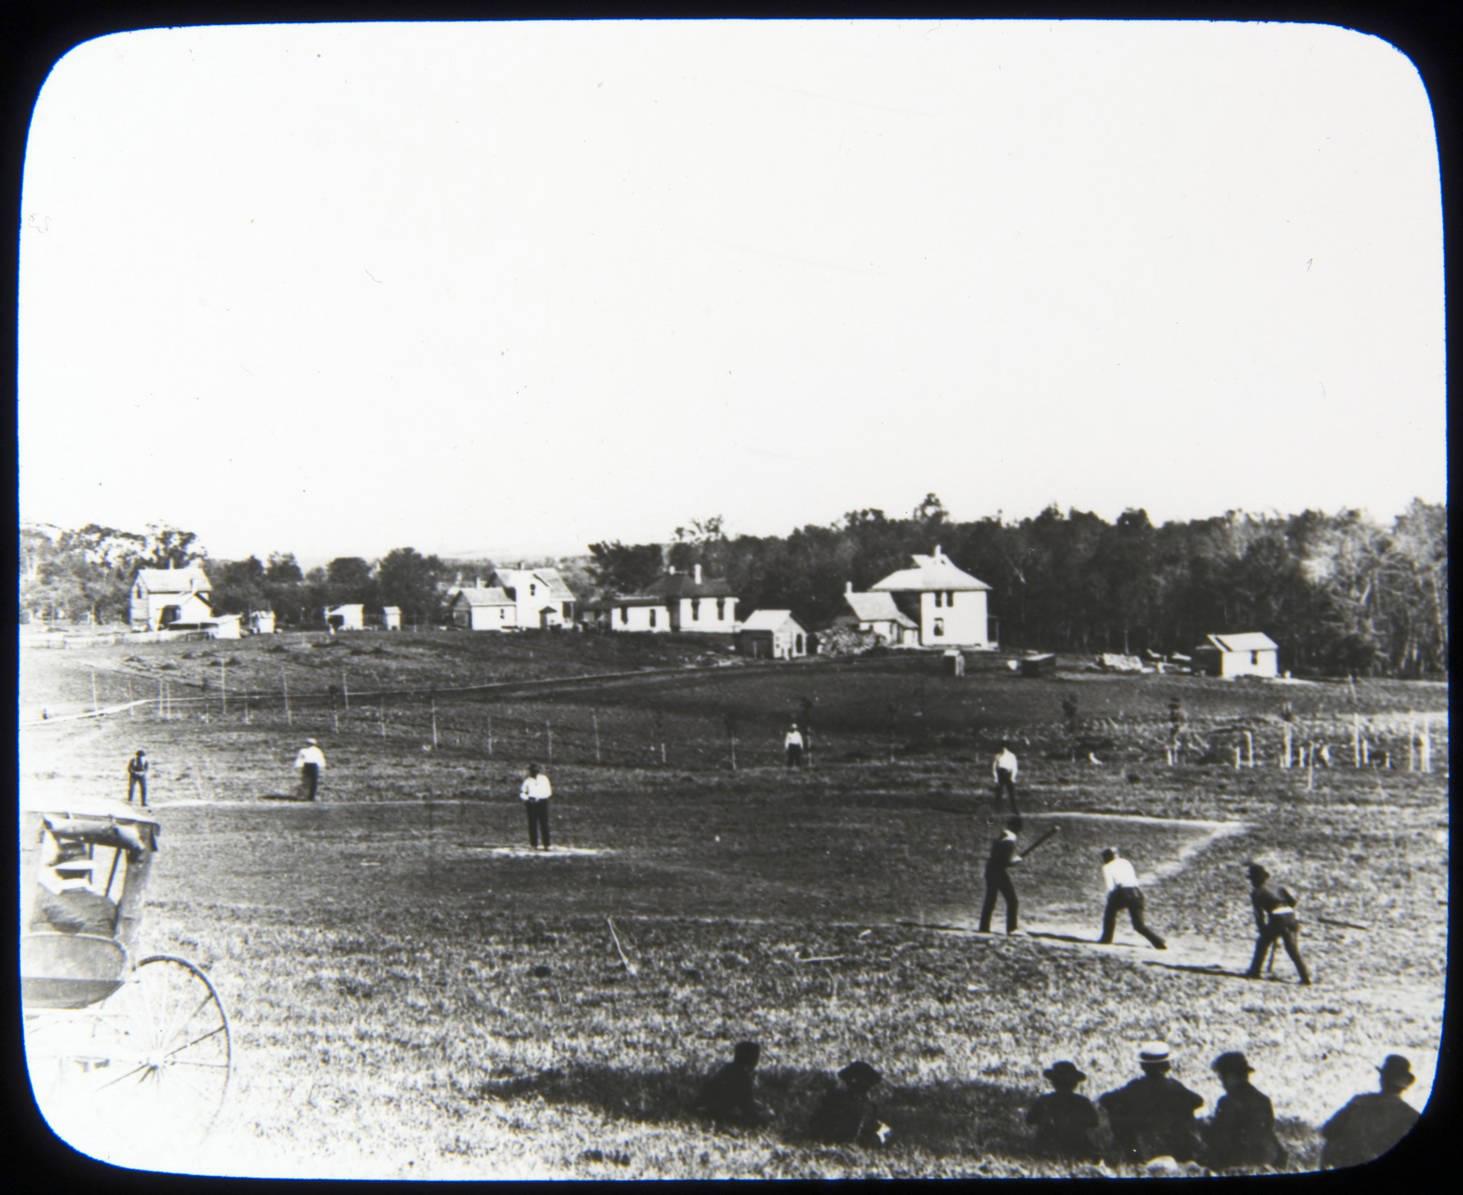 Early baseball game in Northfield, 1887